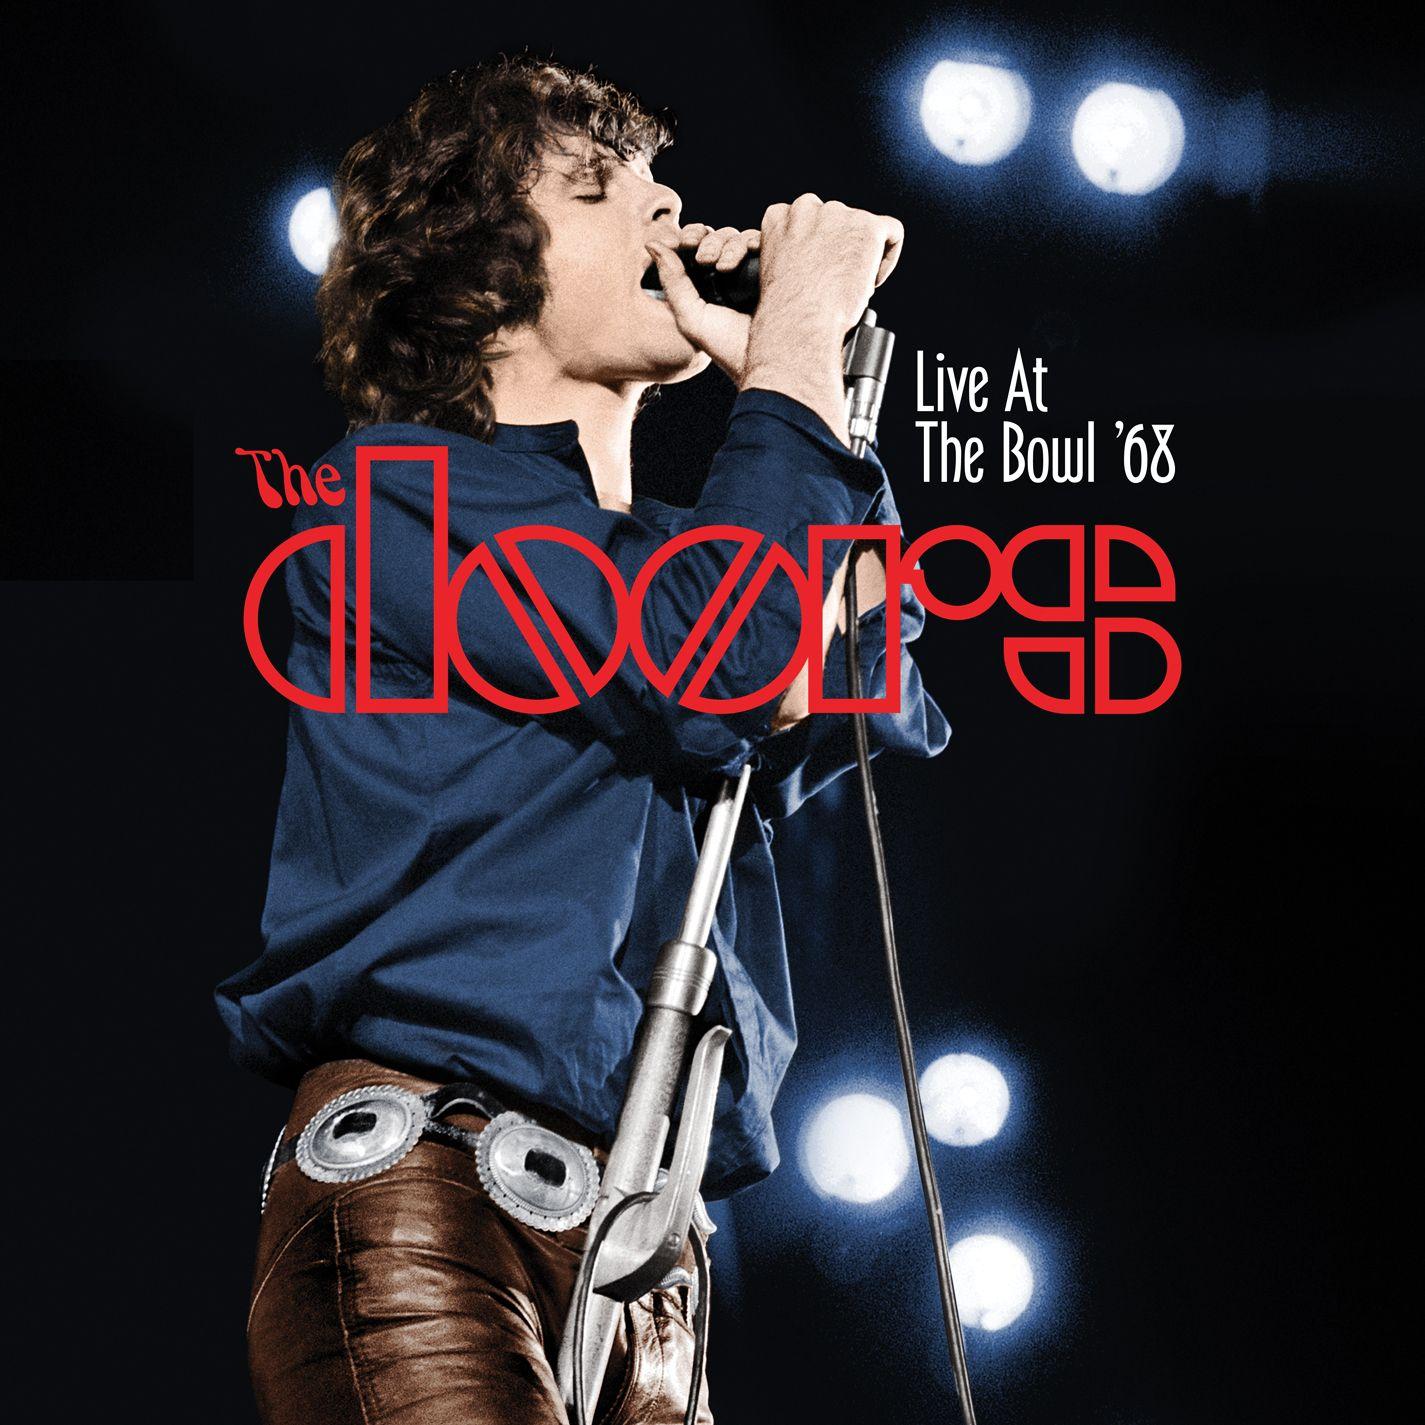 the doors album covers - Google Search | Album Covers I ...  the doors album...